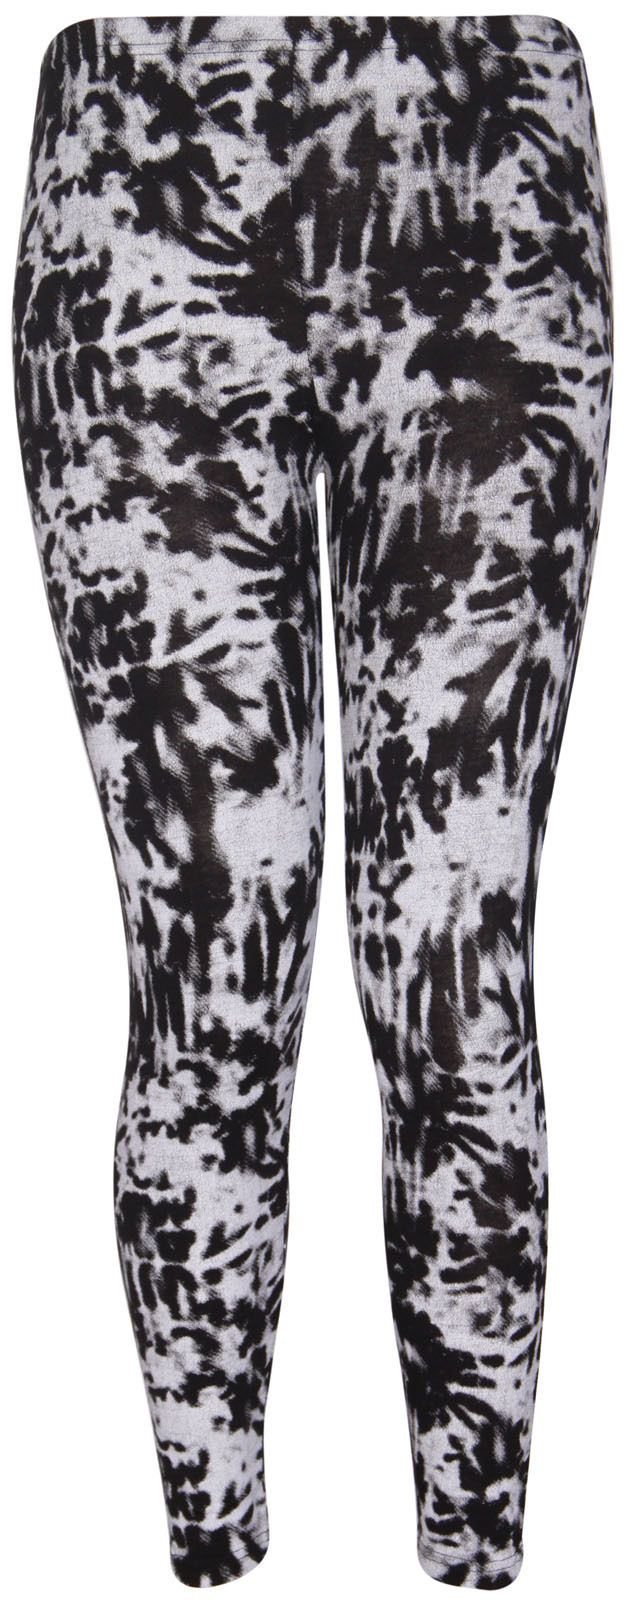 Plus Size Tie Dye Leggings